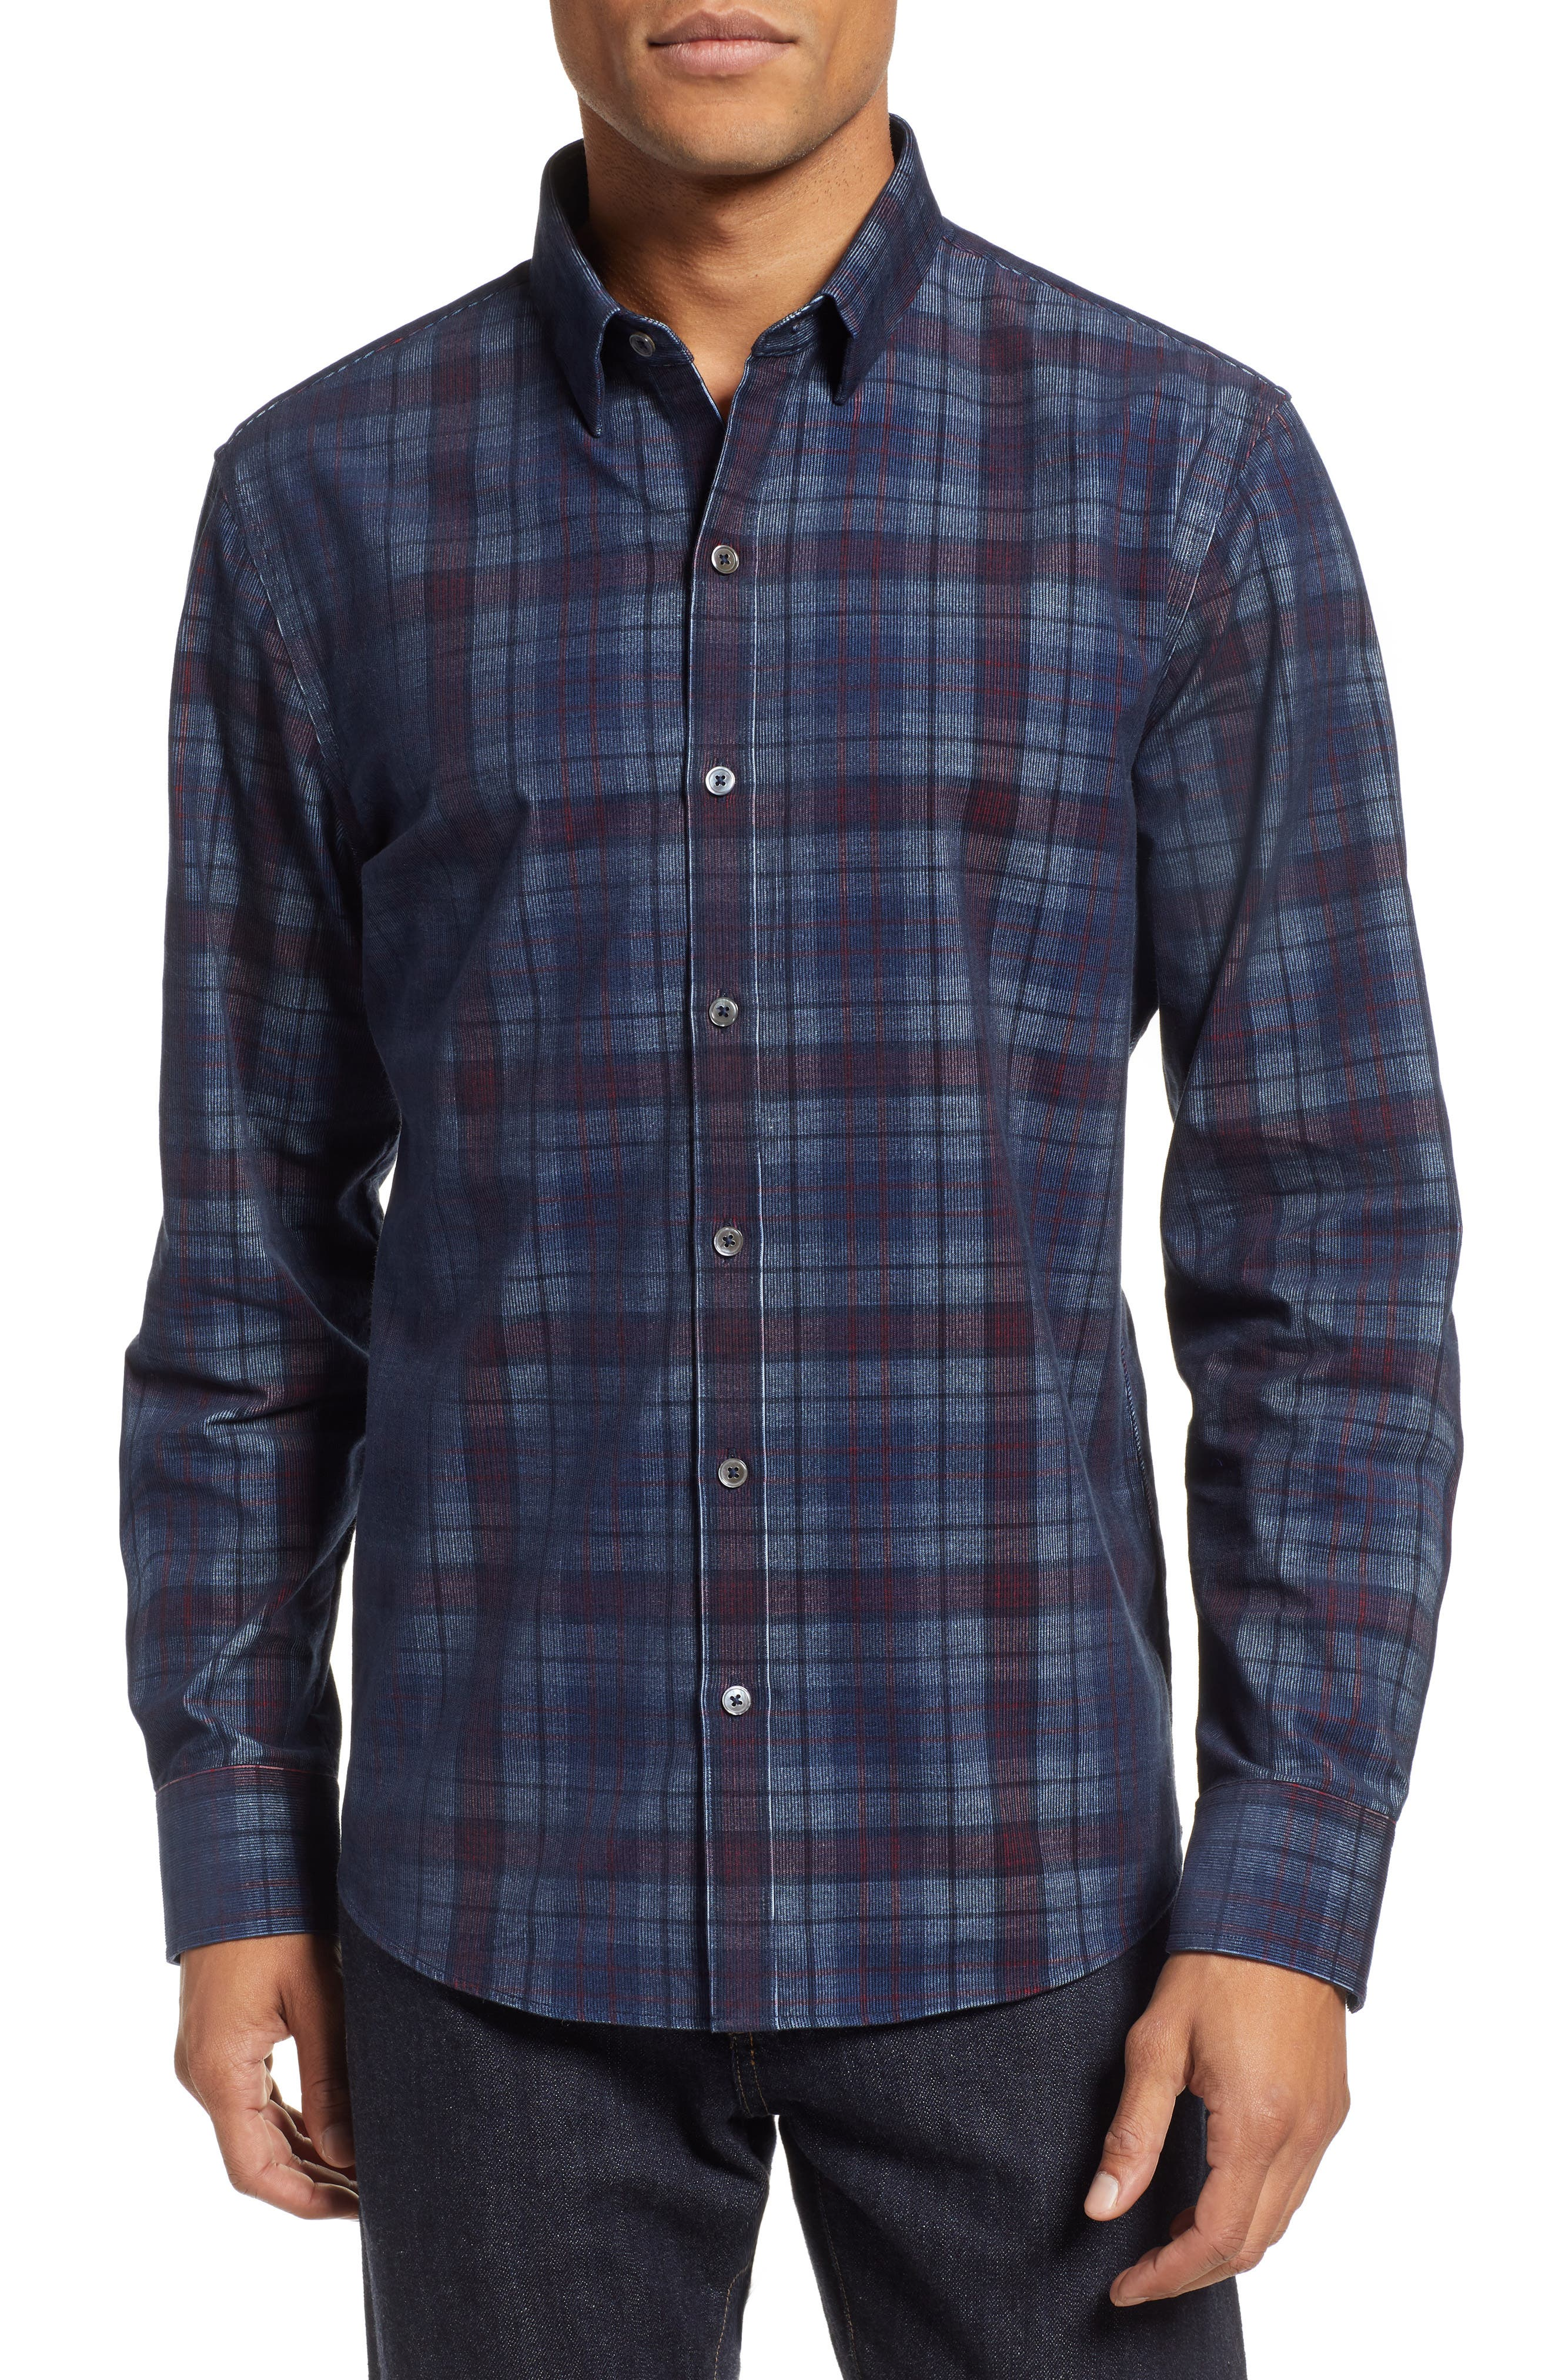 Lemke Regular Fit Corduroy Sport Shirt,                             Main thumbnail 1, color,                             NAVY